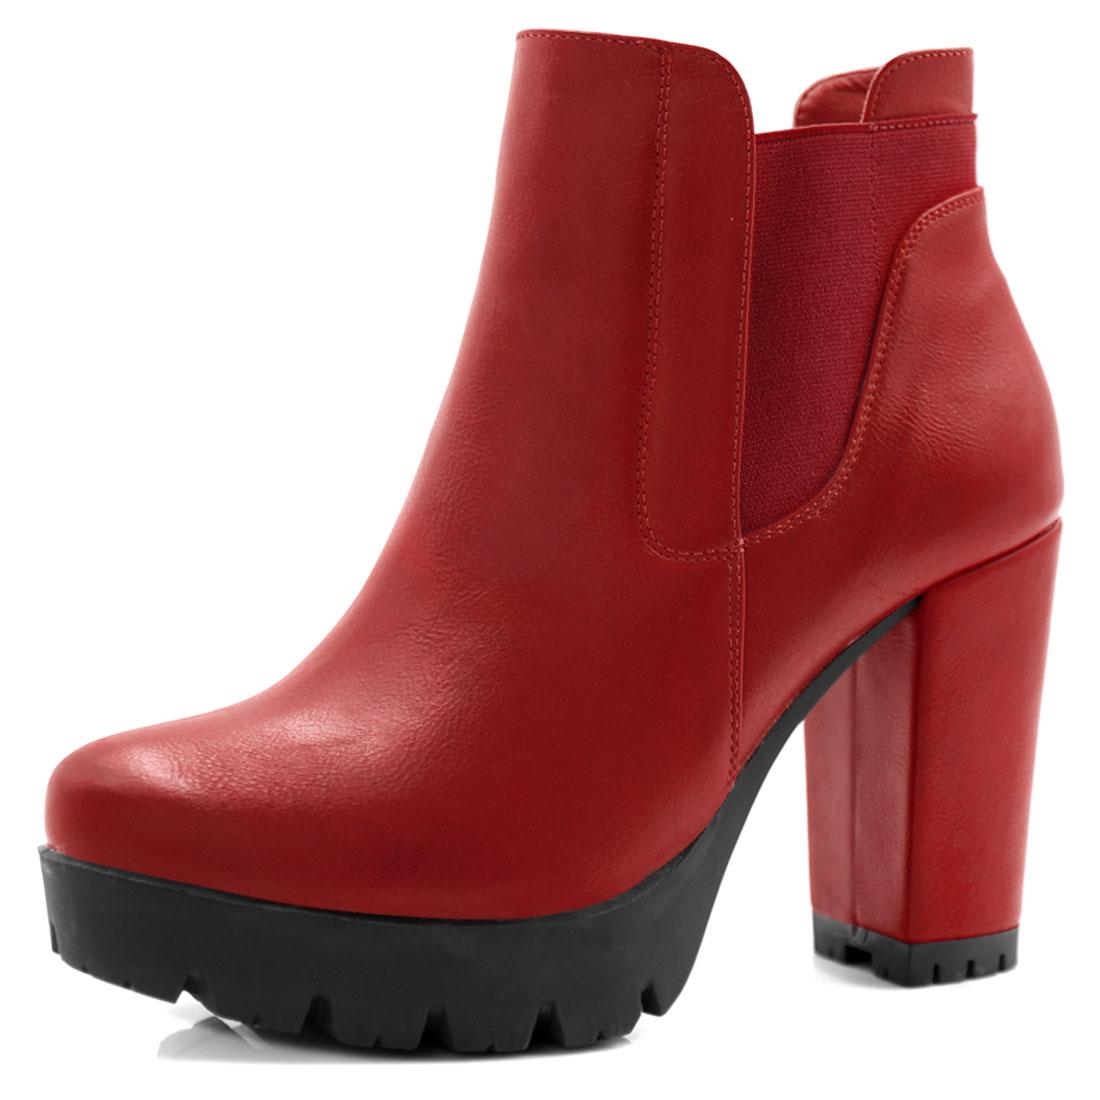 Allegra K Women Chunky High Heel Platform Zipper Chelsea Boots Red US 9